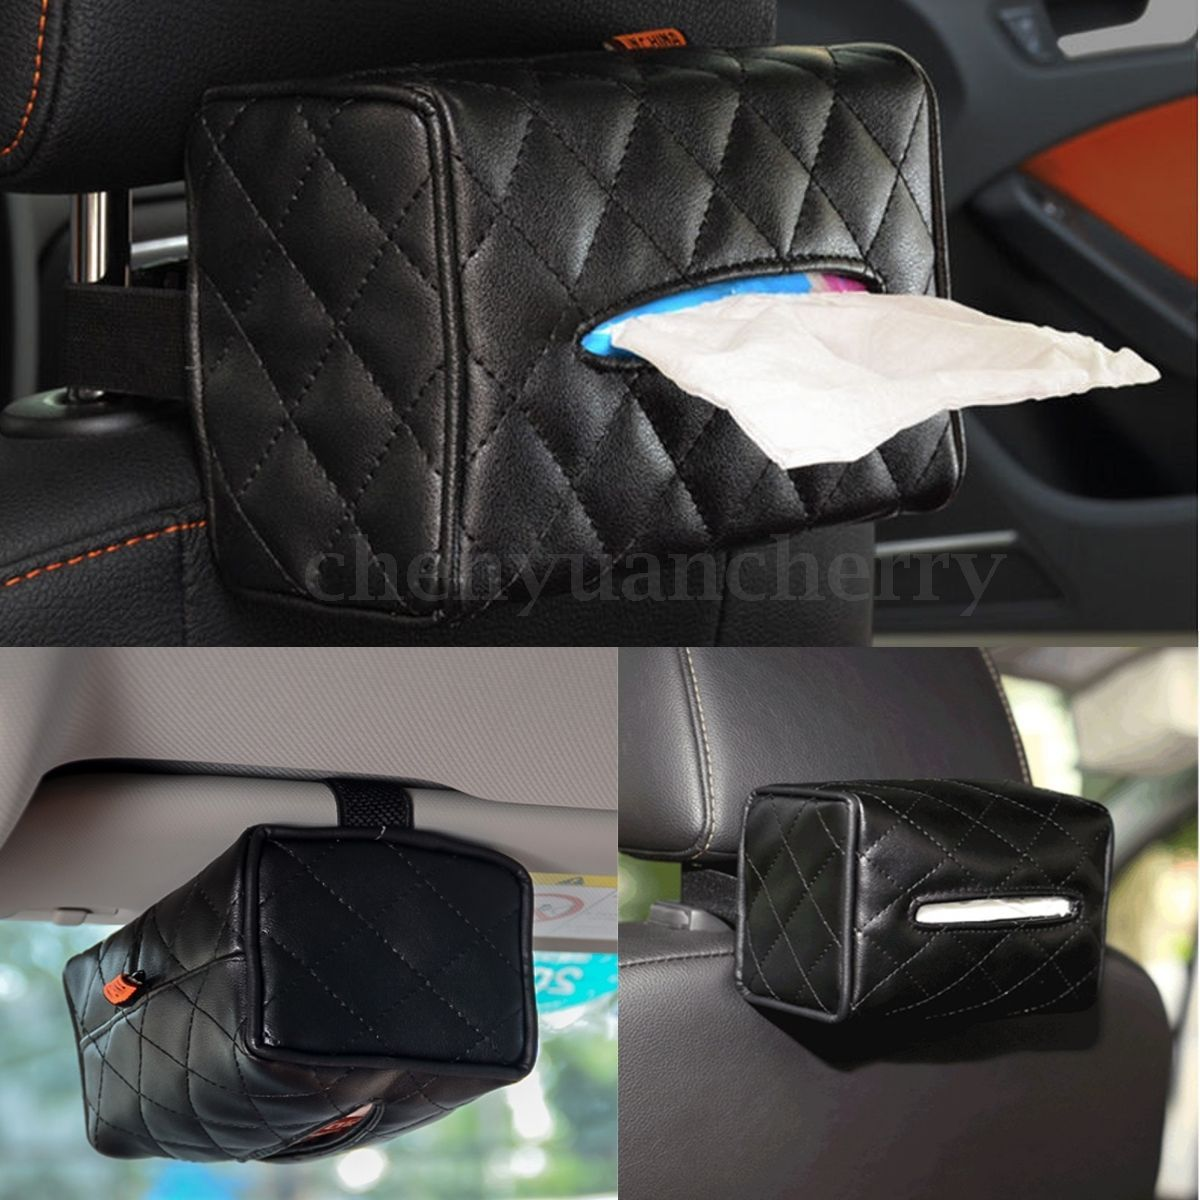 Black  Car PU Leather Tissue Box Cover Seat Paper Hotel Napkin Holder Case UK